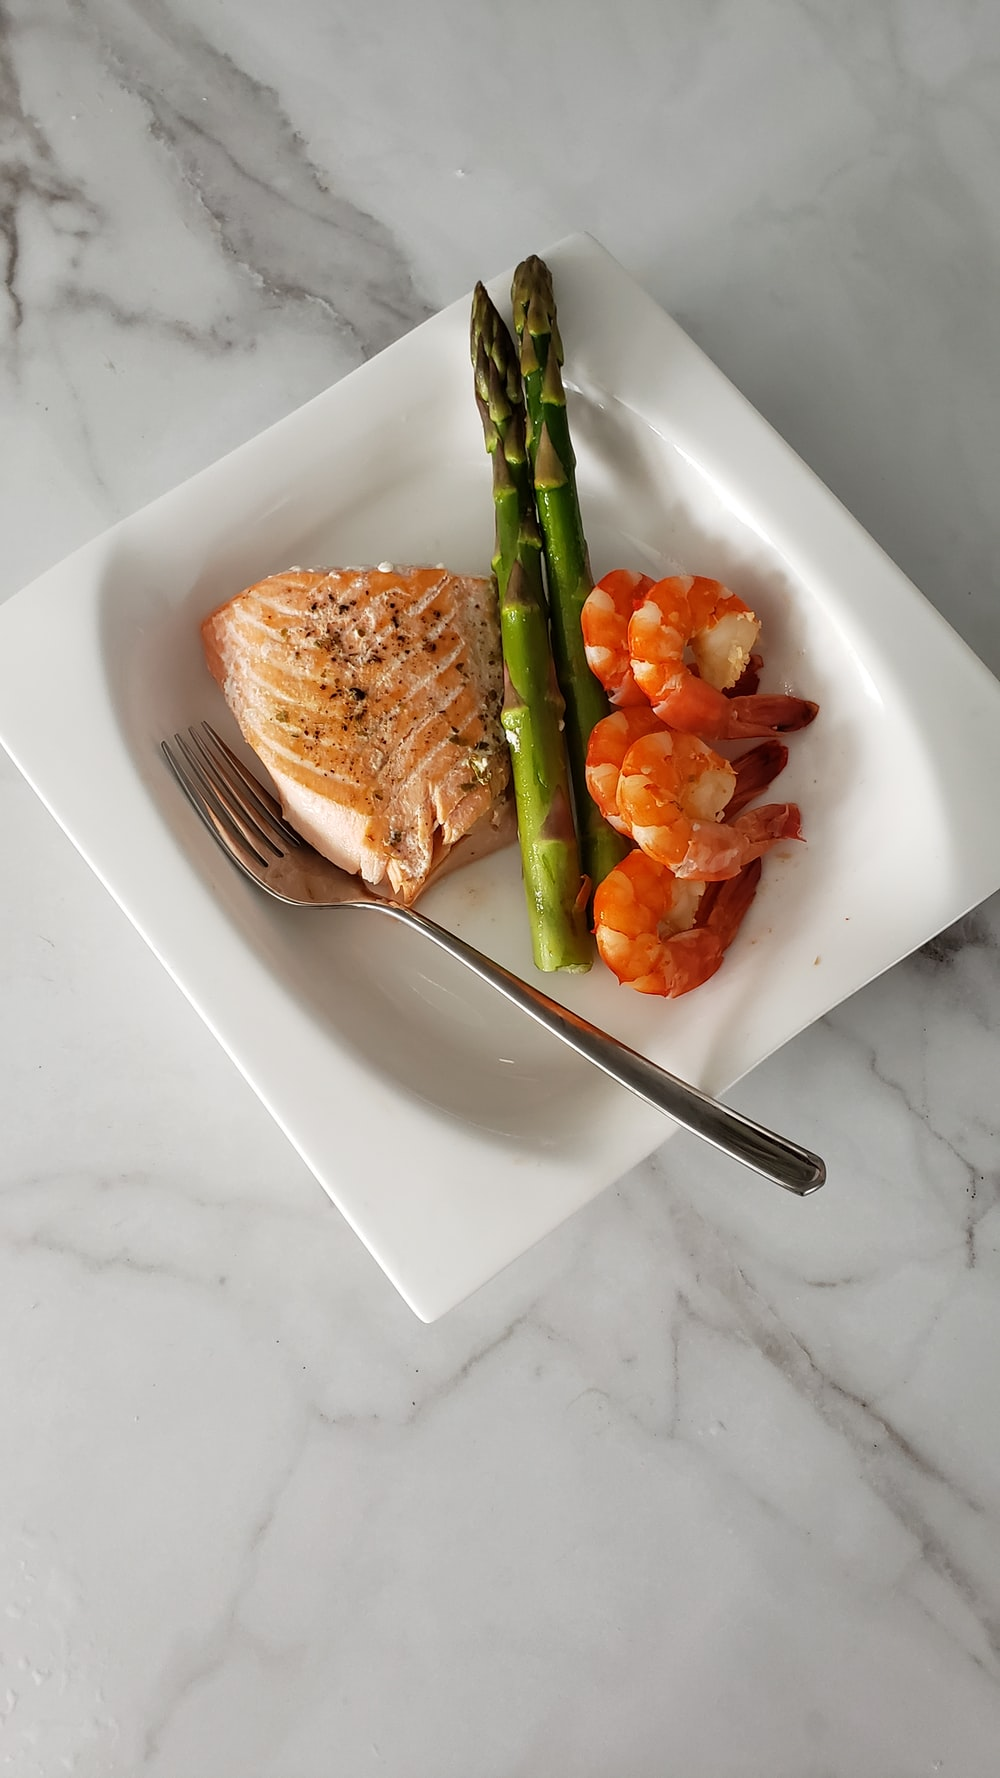 fish and shrimp dish